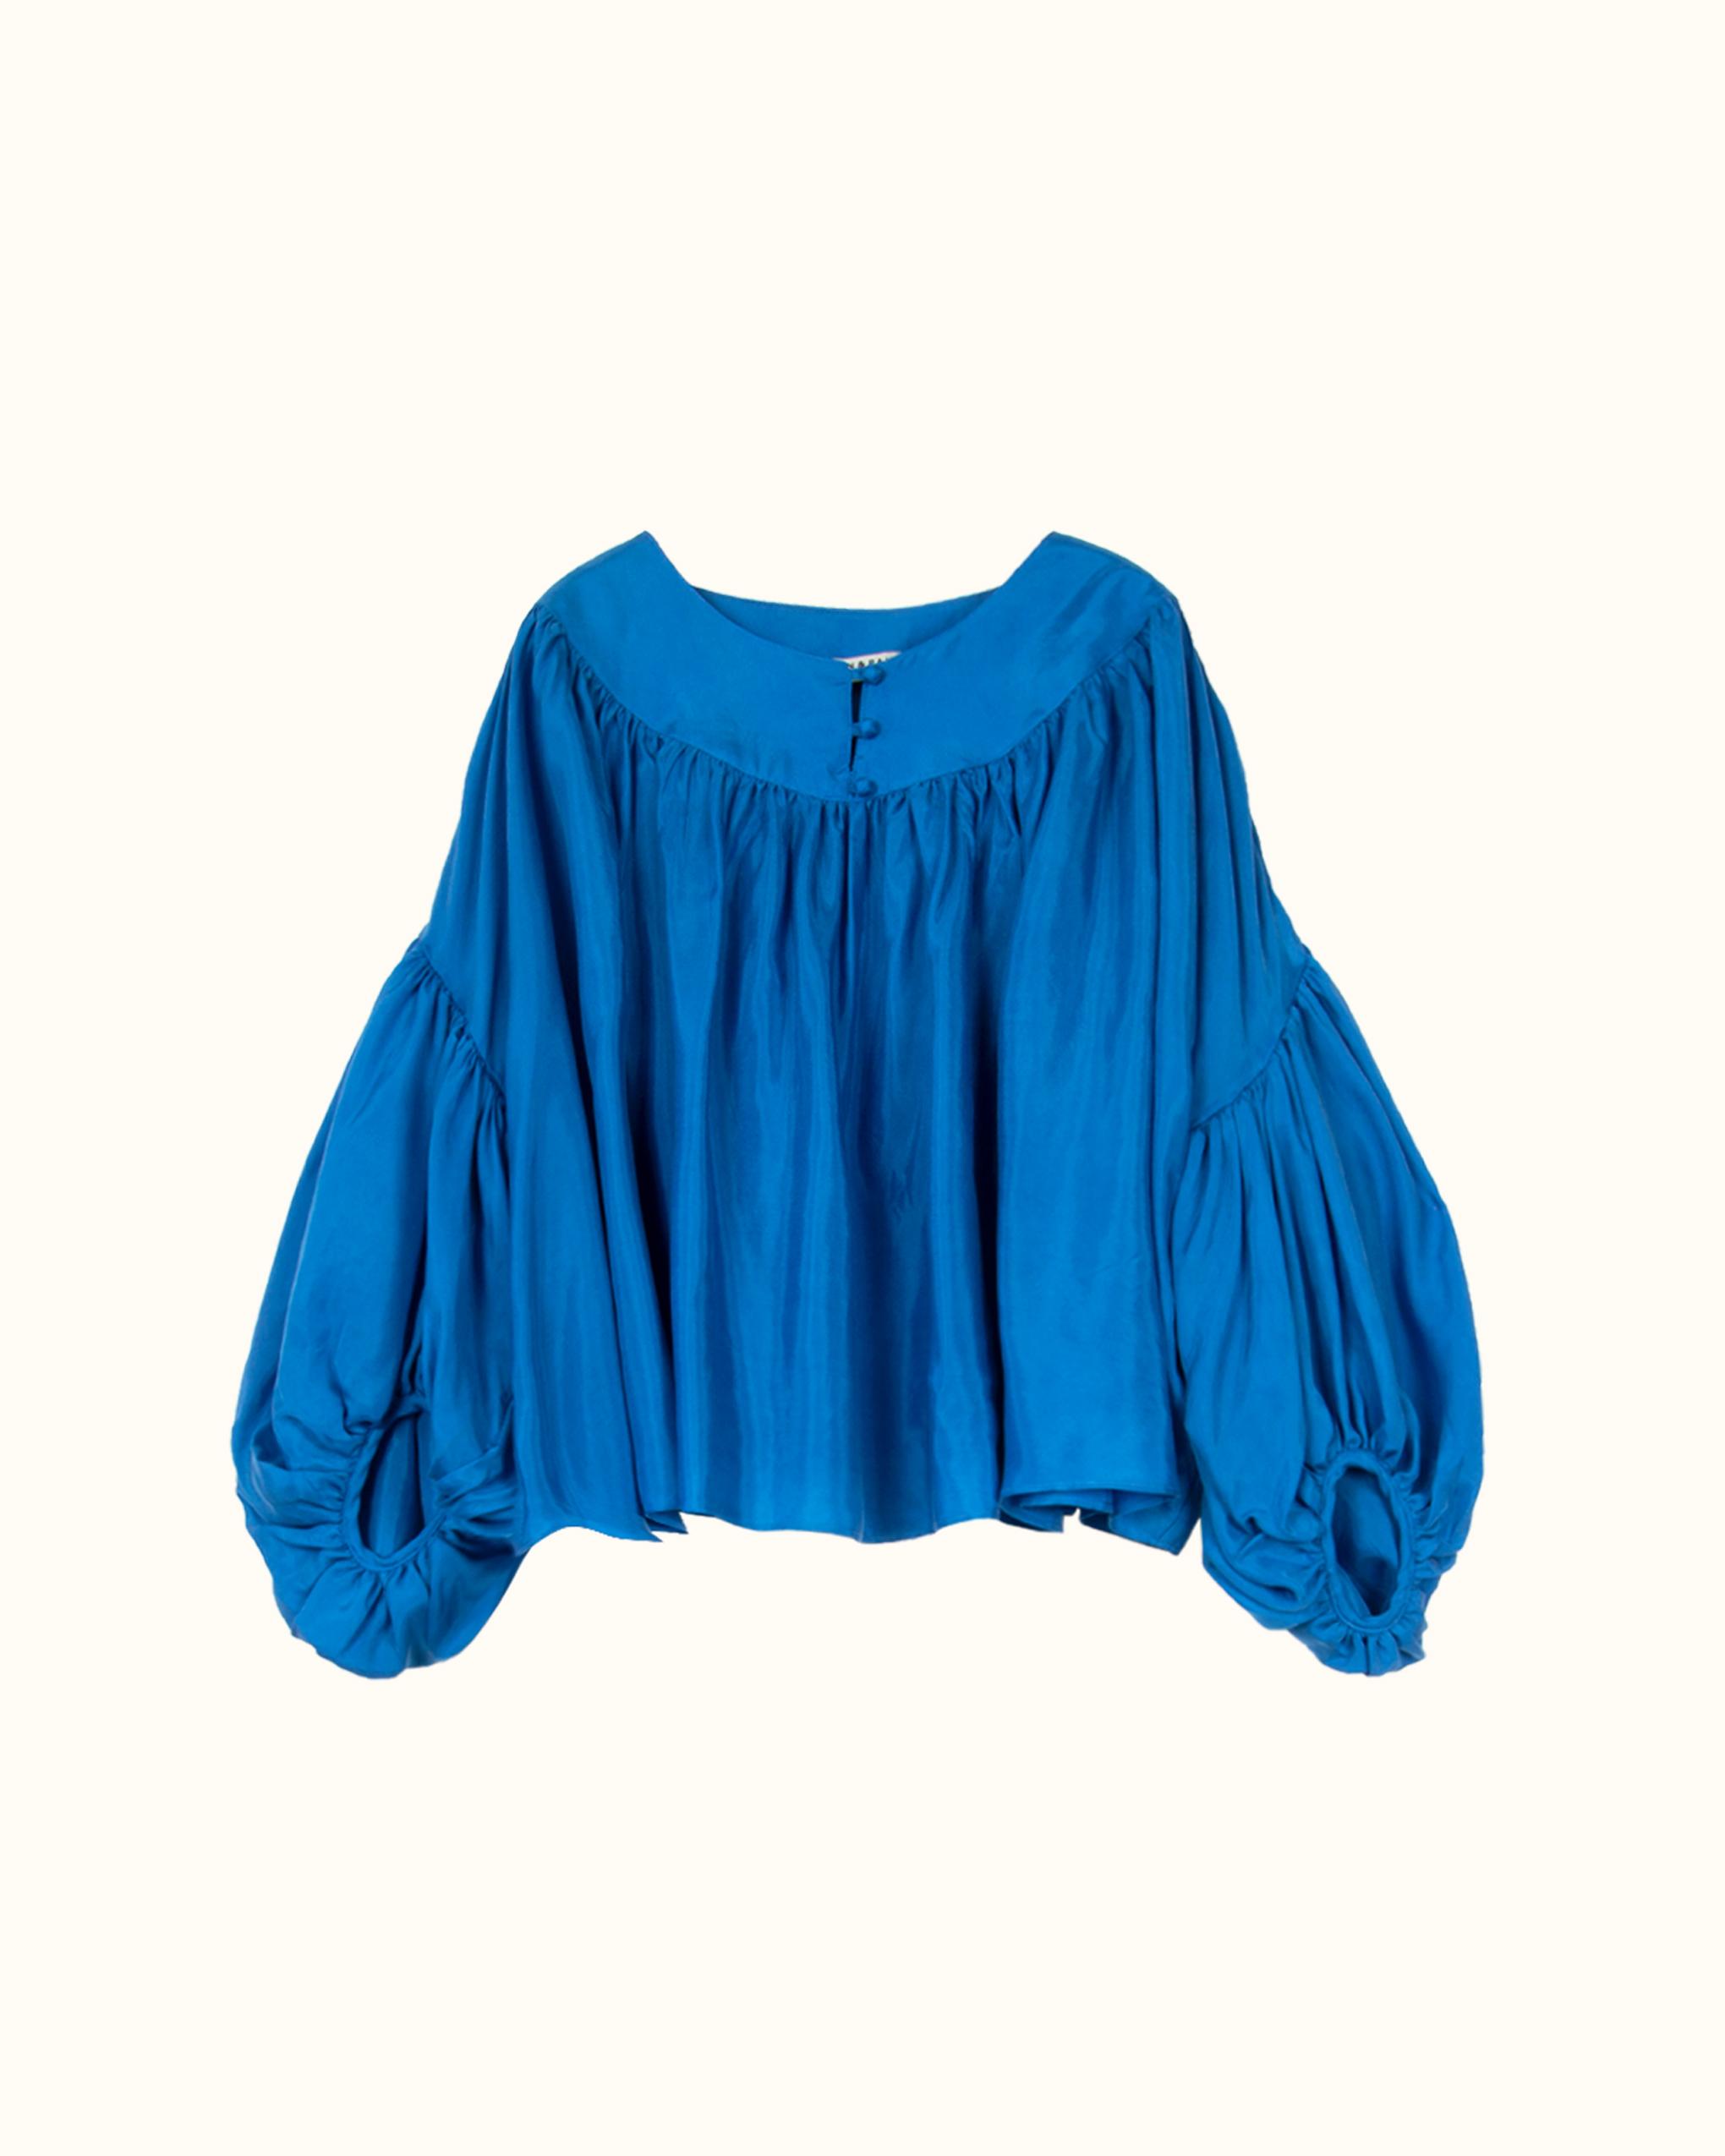 A cobalt blue volume blouse.